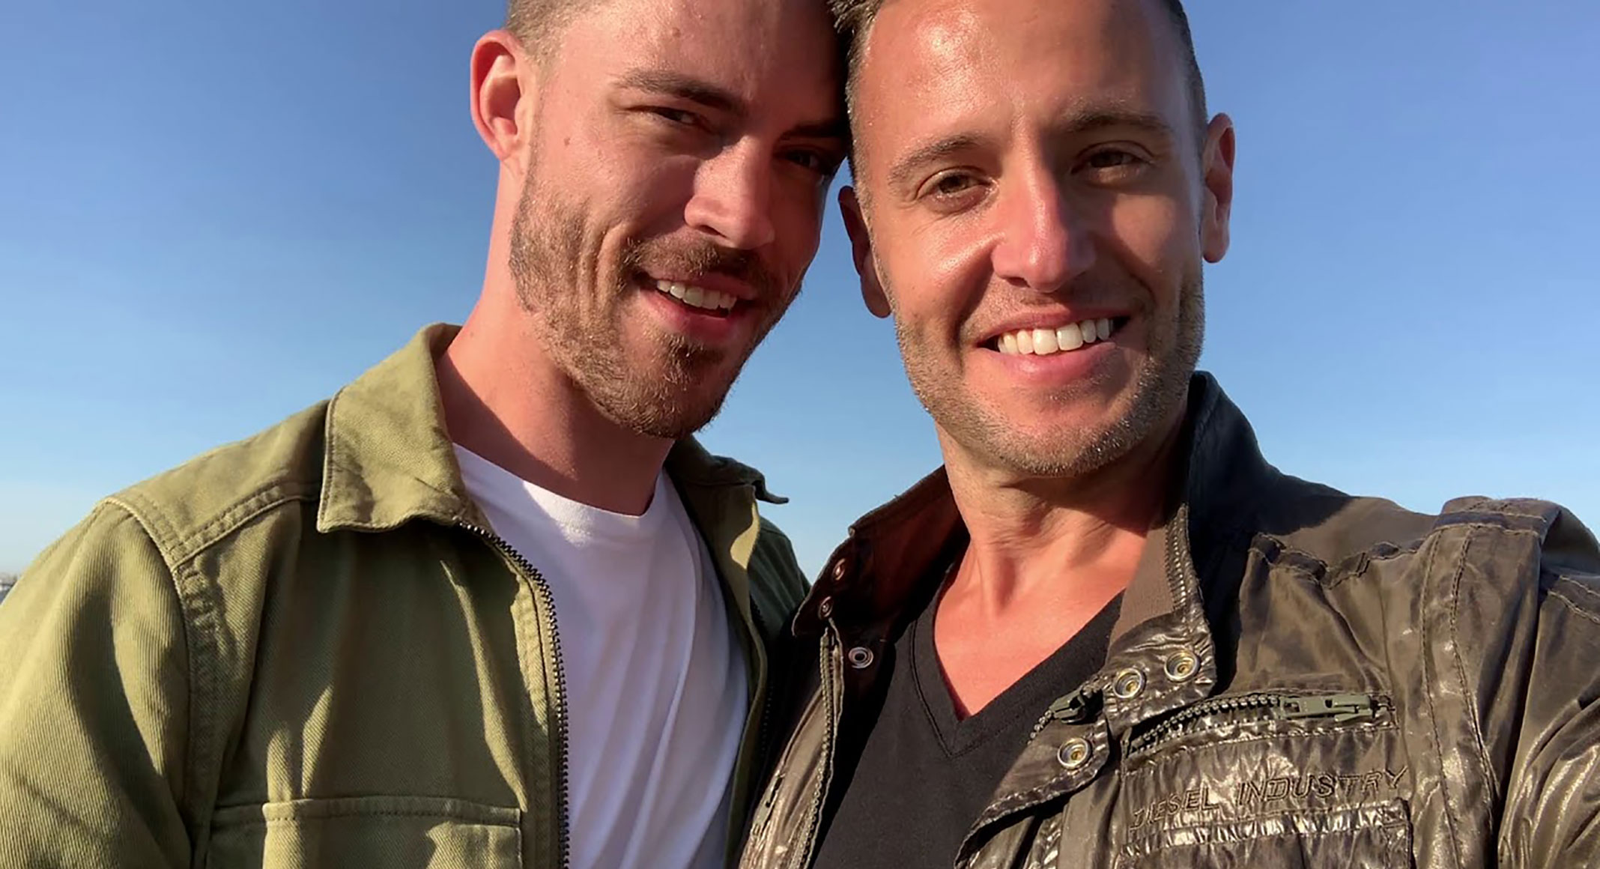 Branden & James